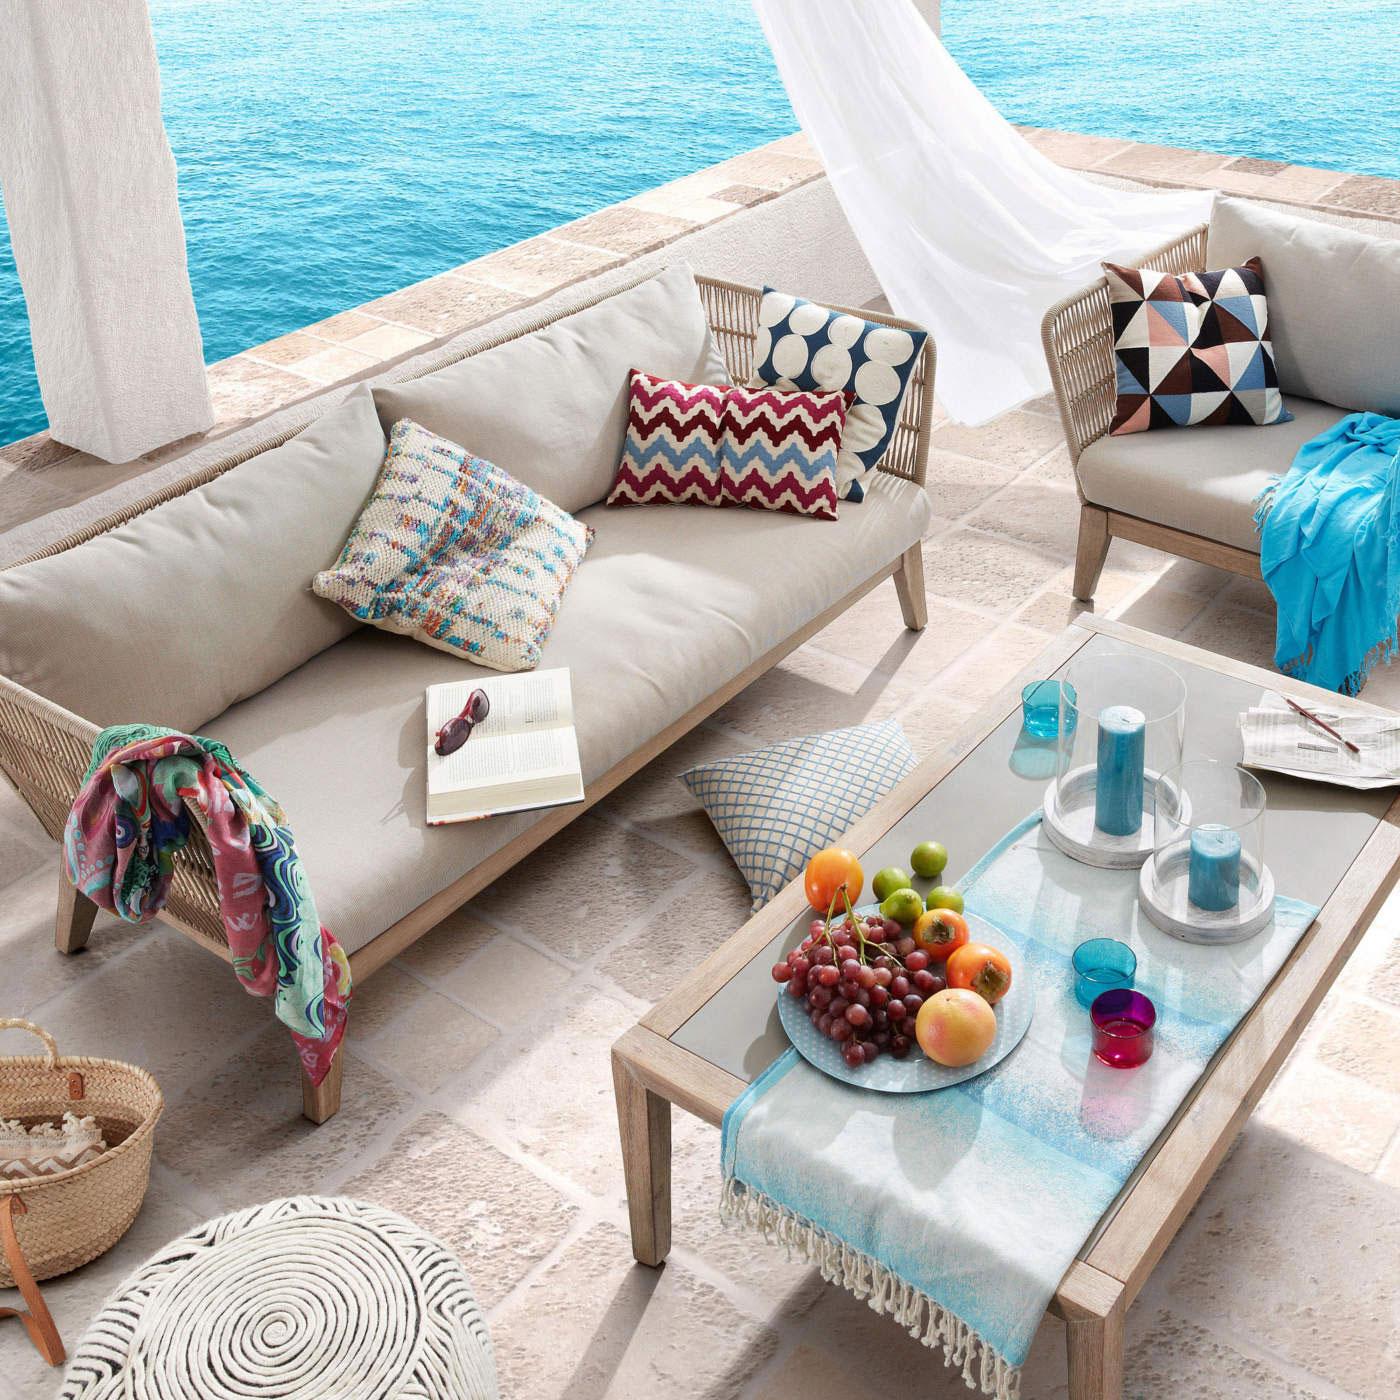 aluminium sofa set, outdoor furniture comfy living set, pool side sofa, salonaki nude, sofa living set nude colours, trapezaki me kanape exoterikou xorou, comfy and stylish modern sofa set